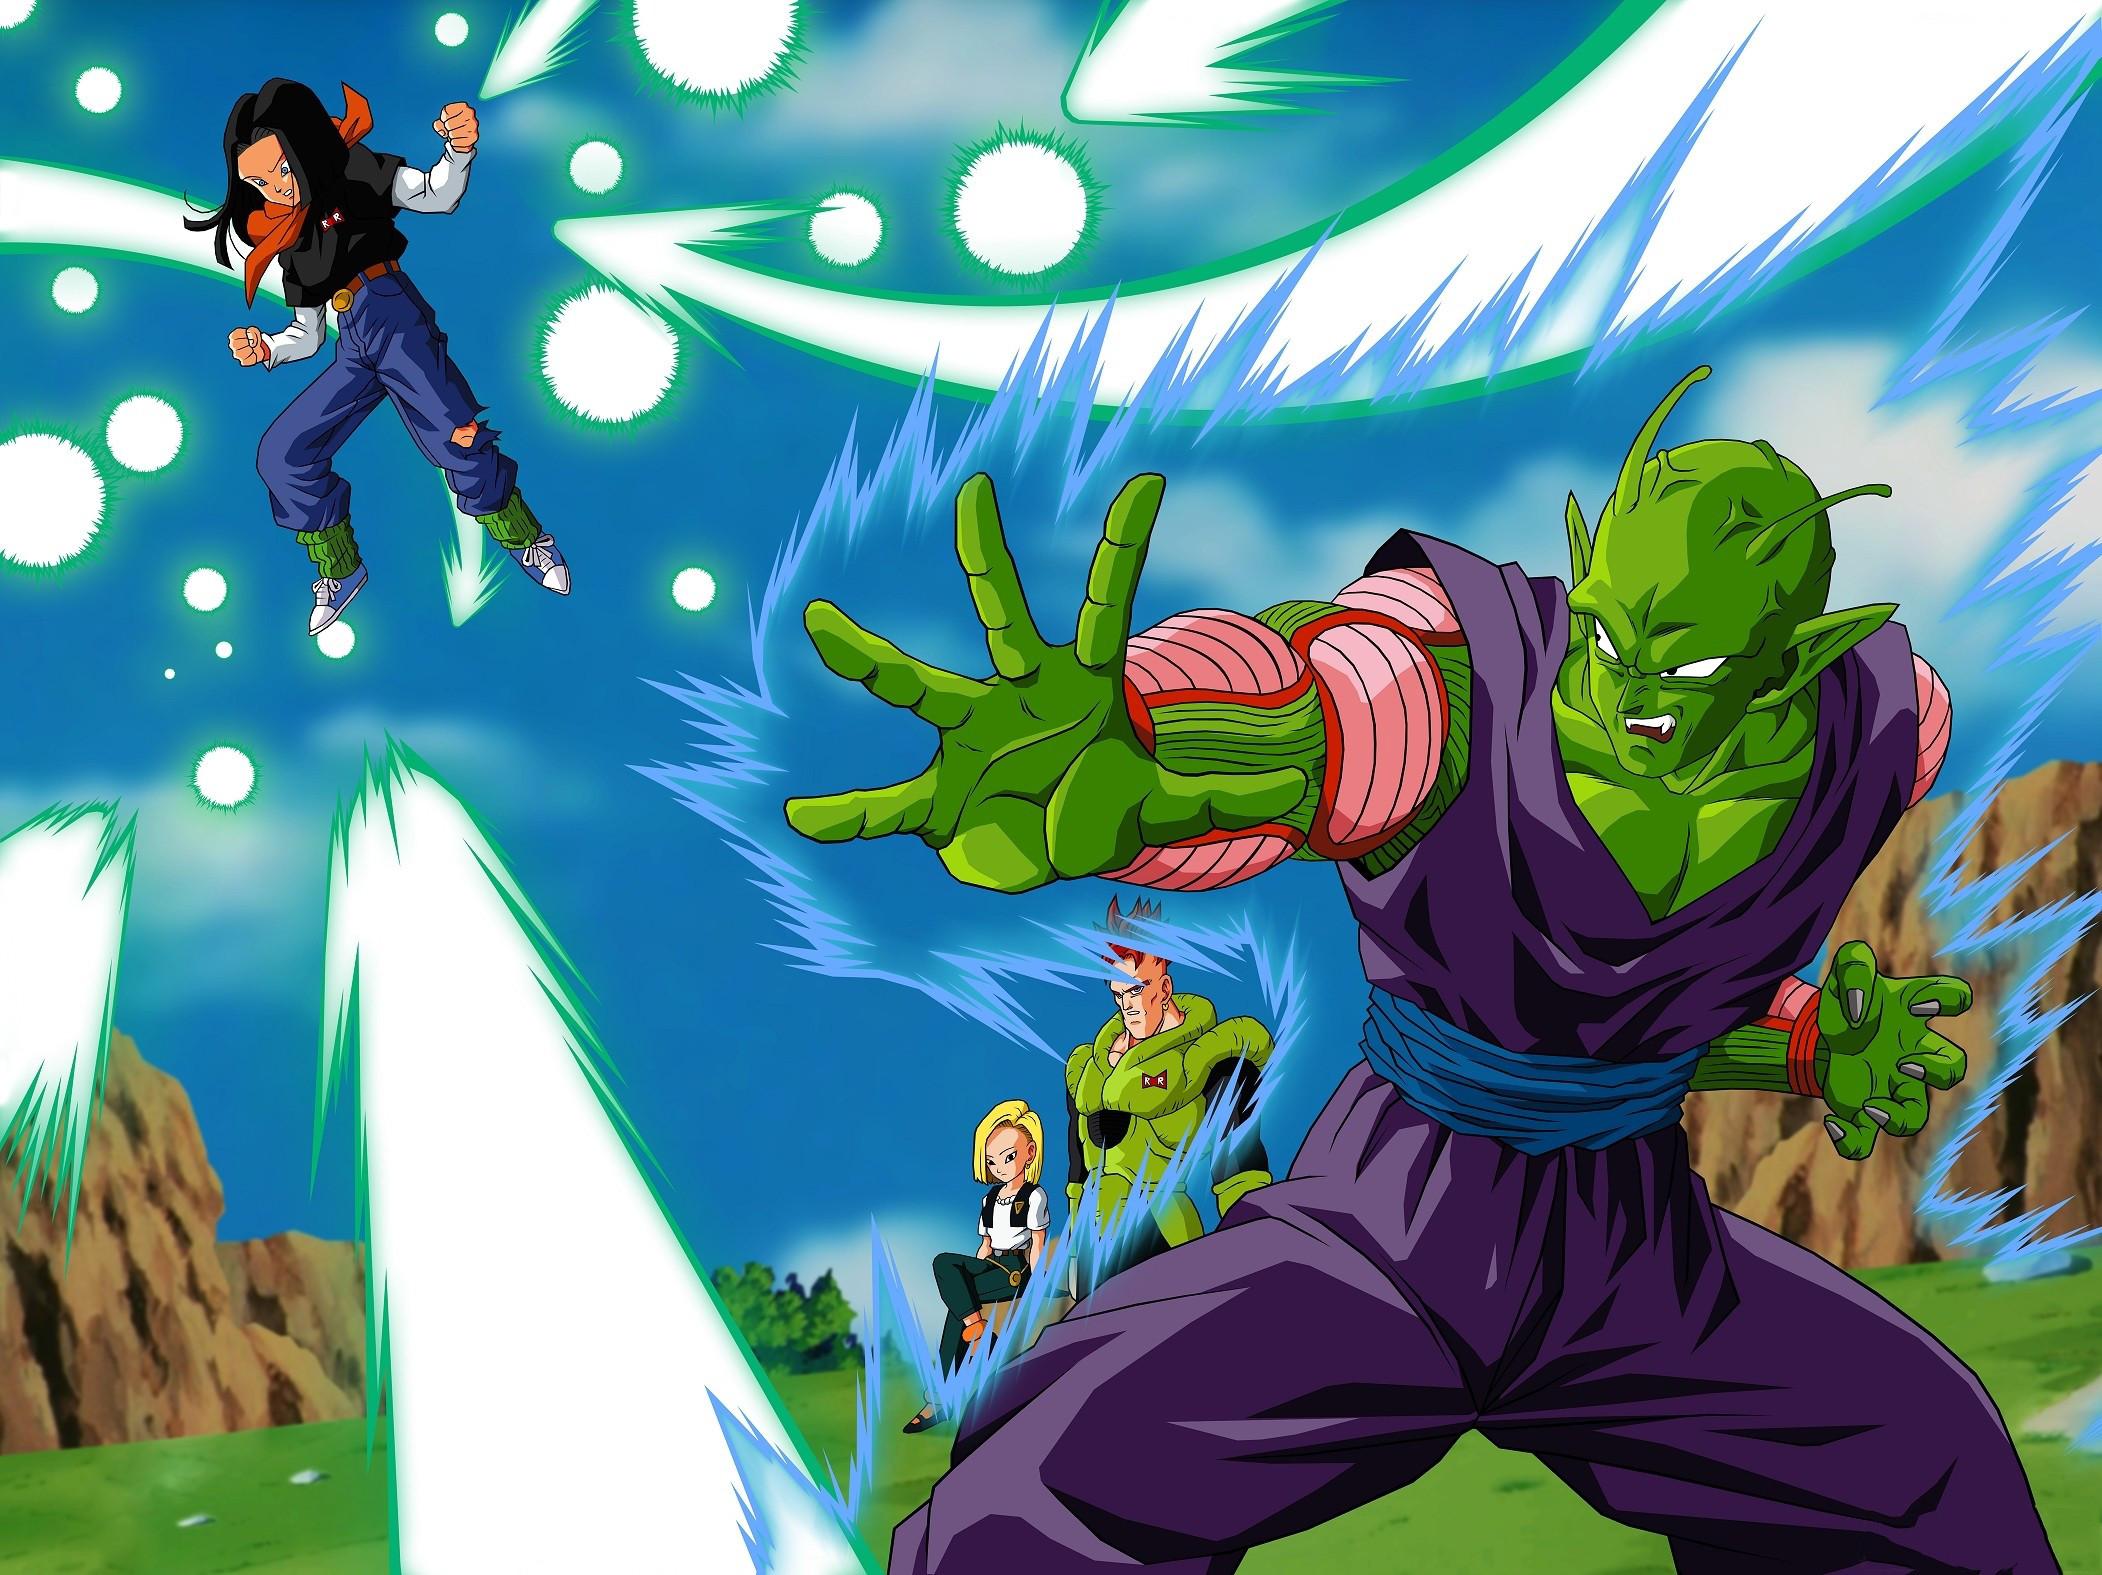 Dragon Ball Z Piccolo Wallpaper 68 Images